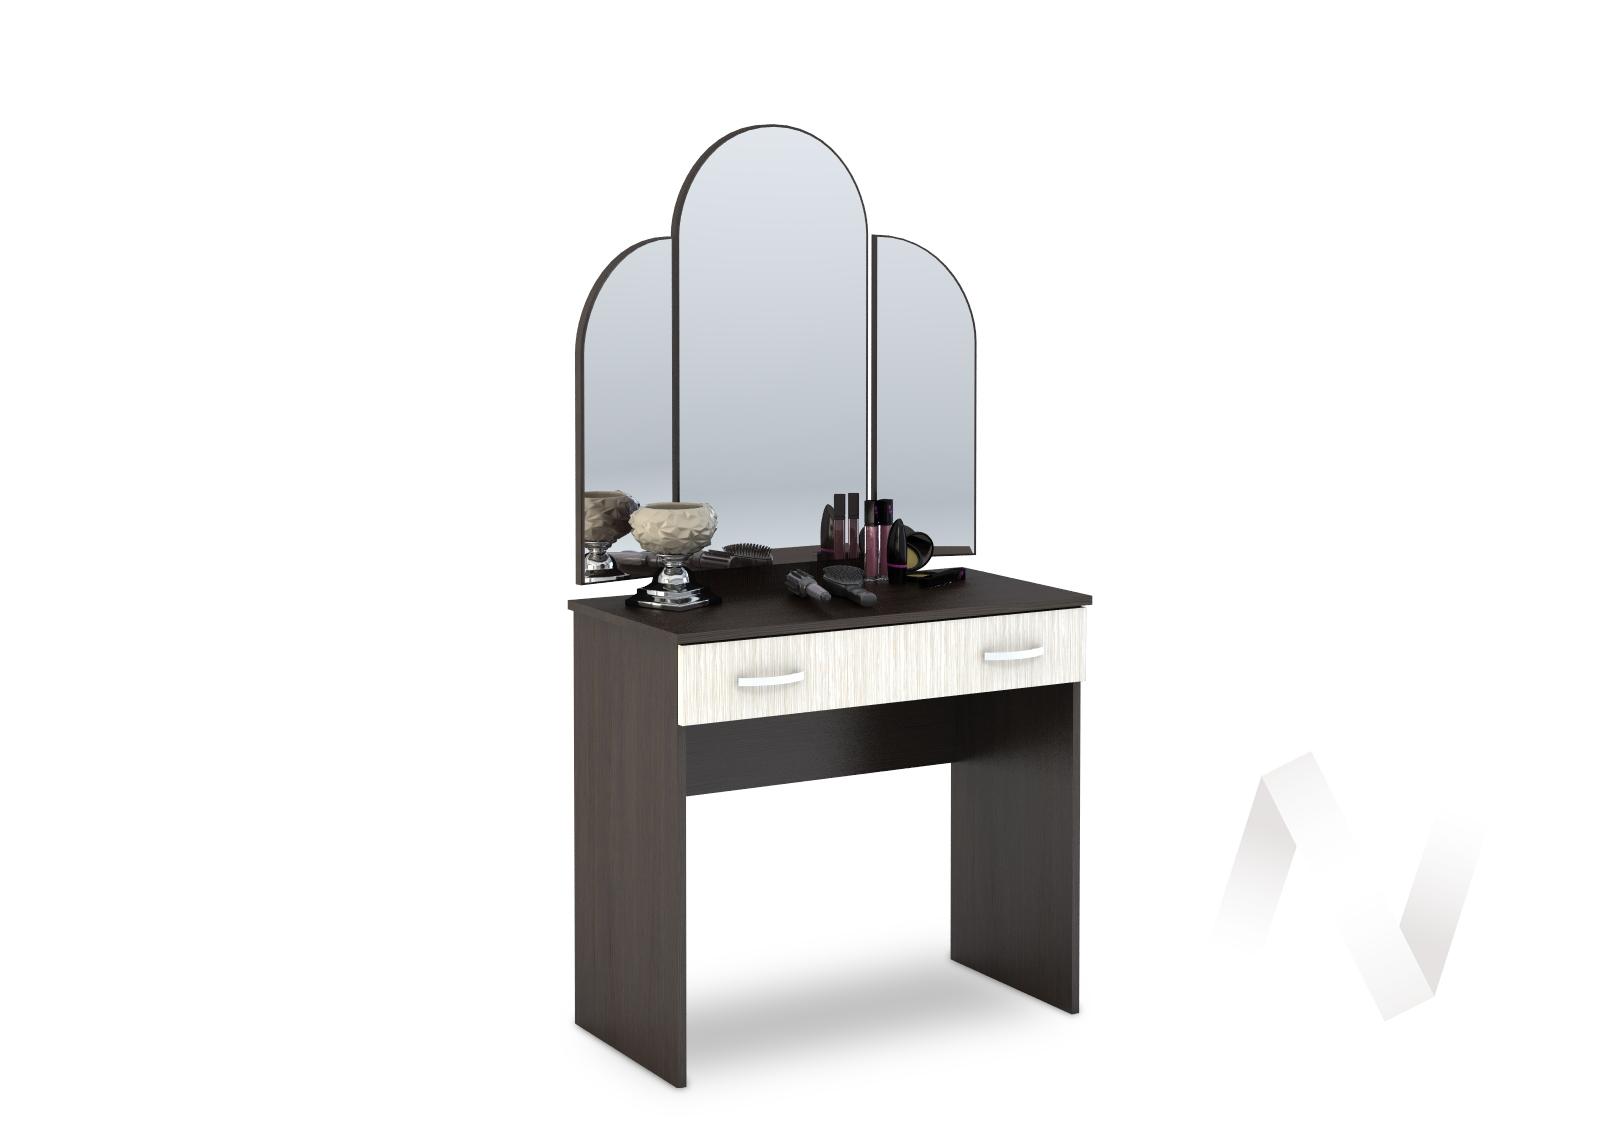 Бася Стол макияжный ЛДСП(венге/дуб бел) СТ 551